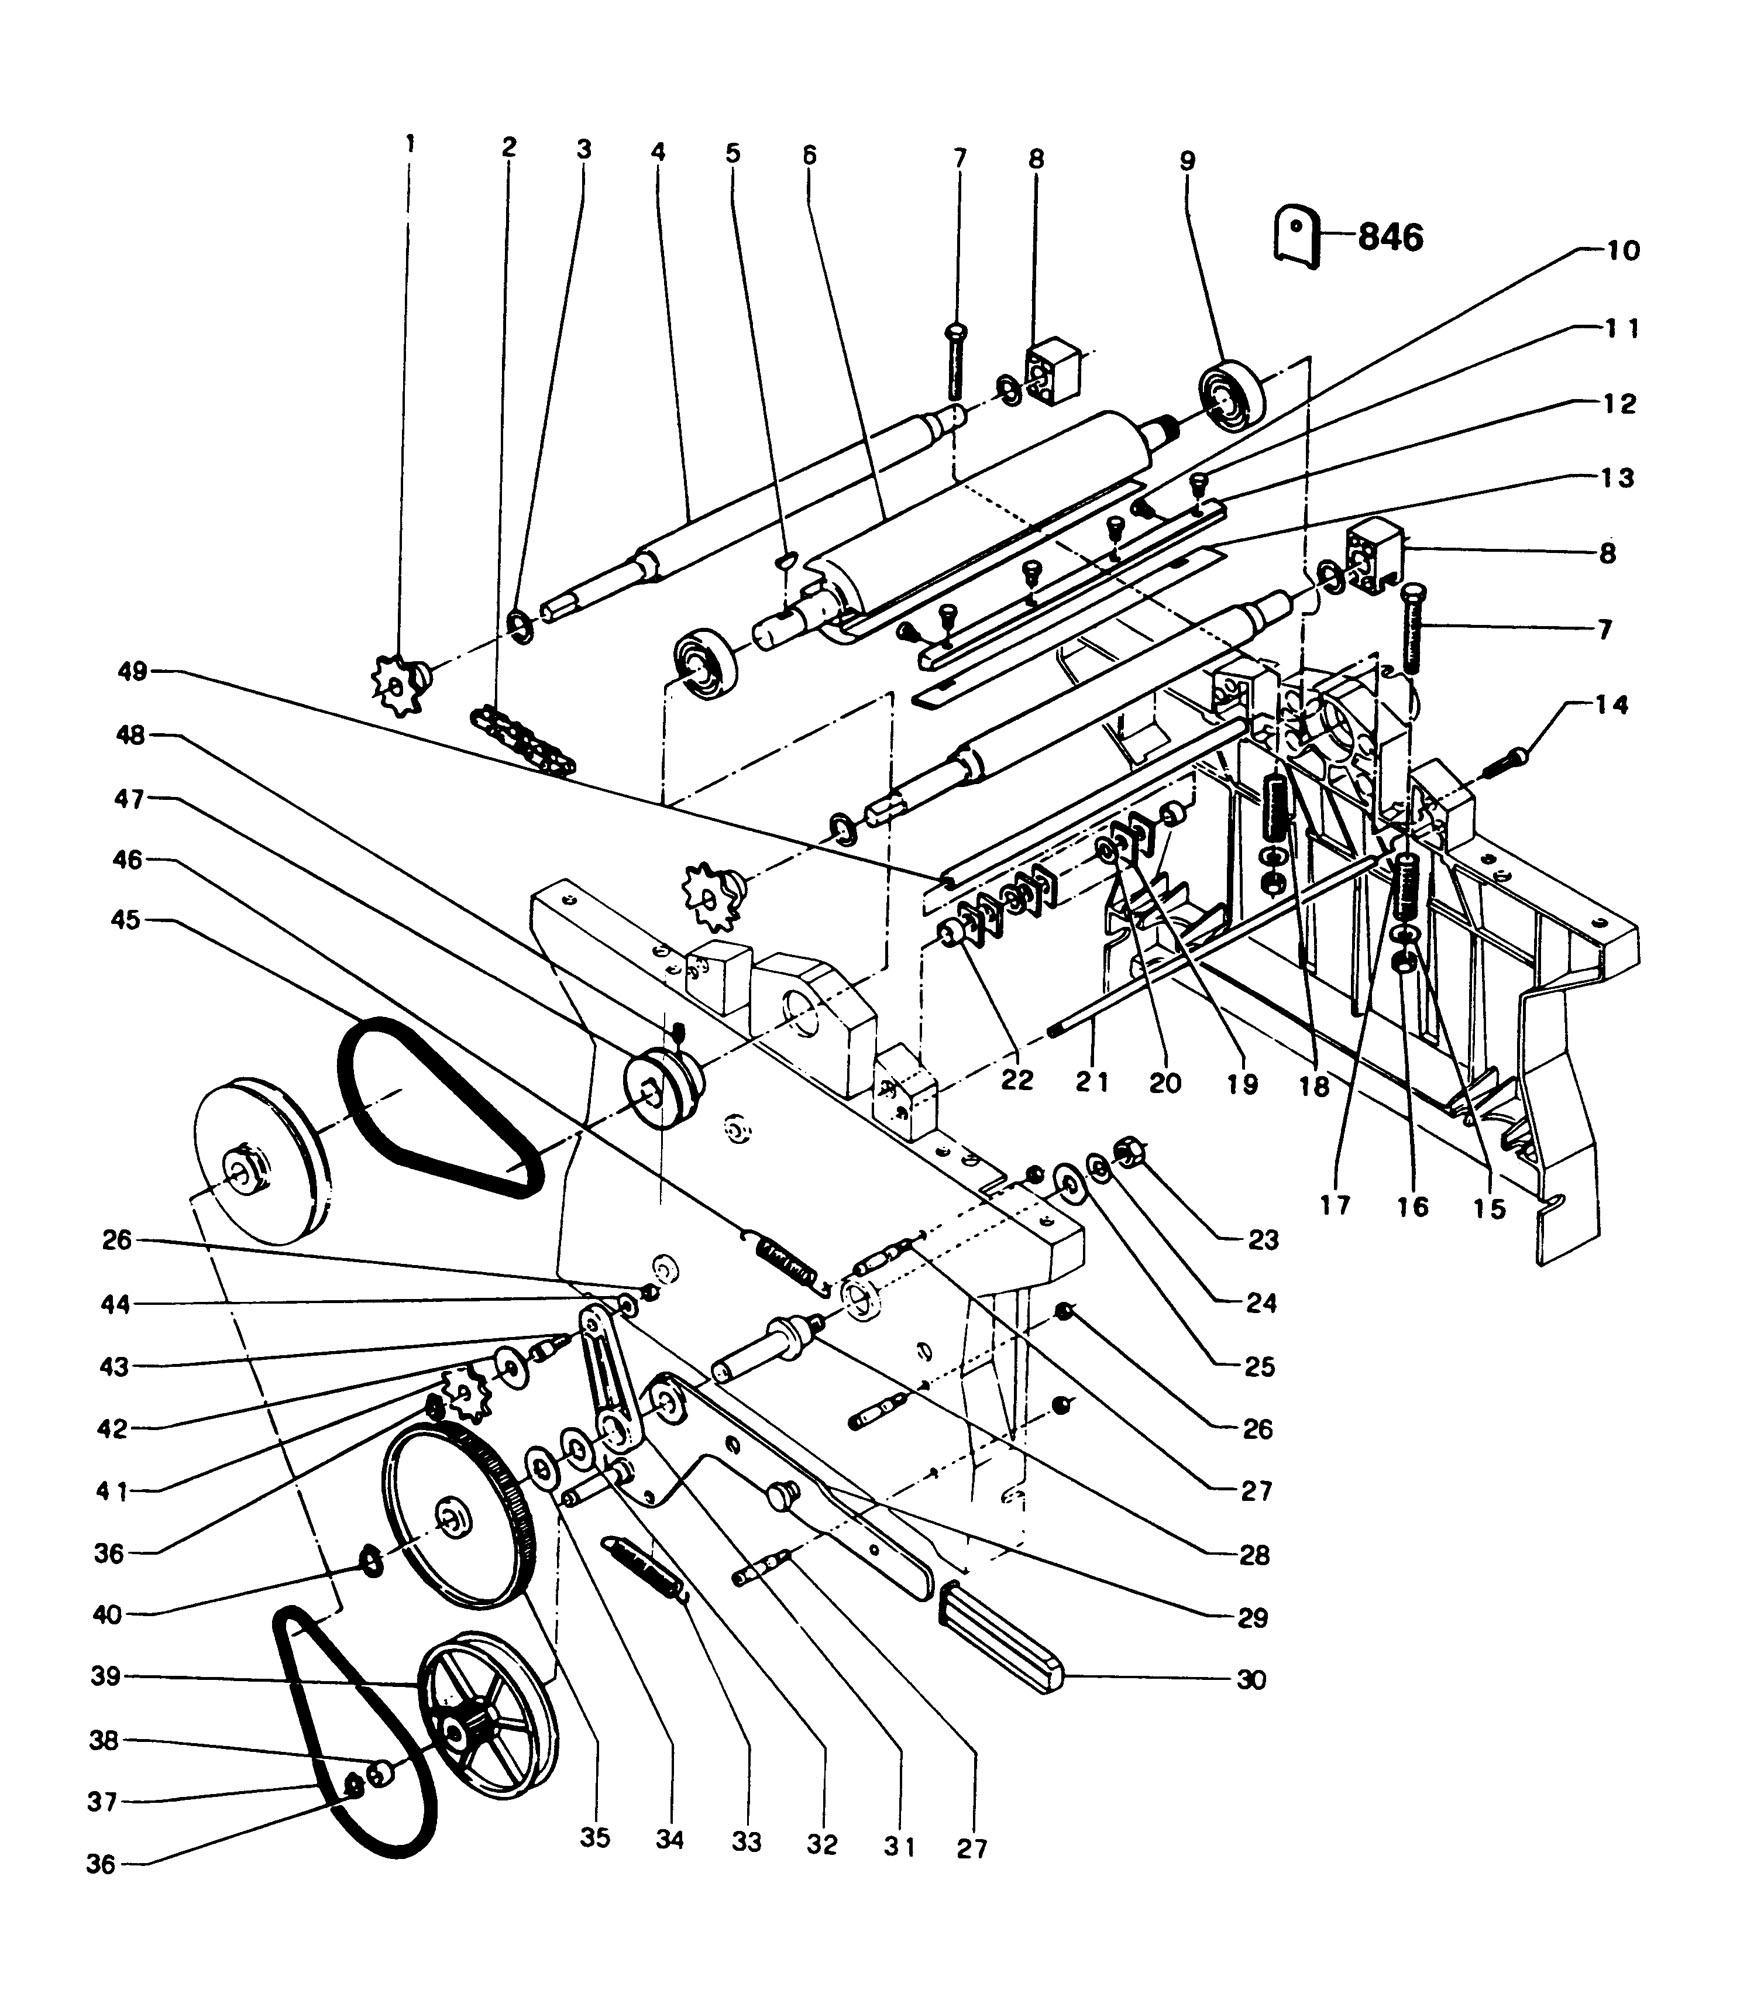 hight resolution of spares for dewalt dw1150 k planer thicknesser type 1 dewalt planer wiring diagram